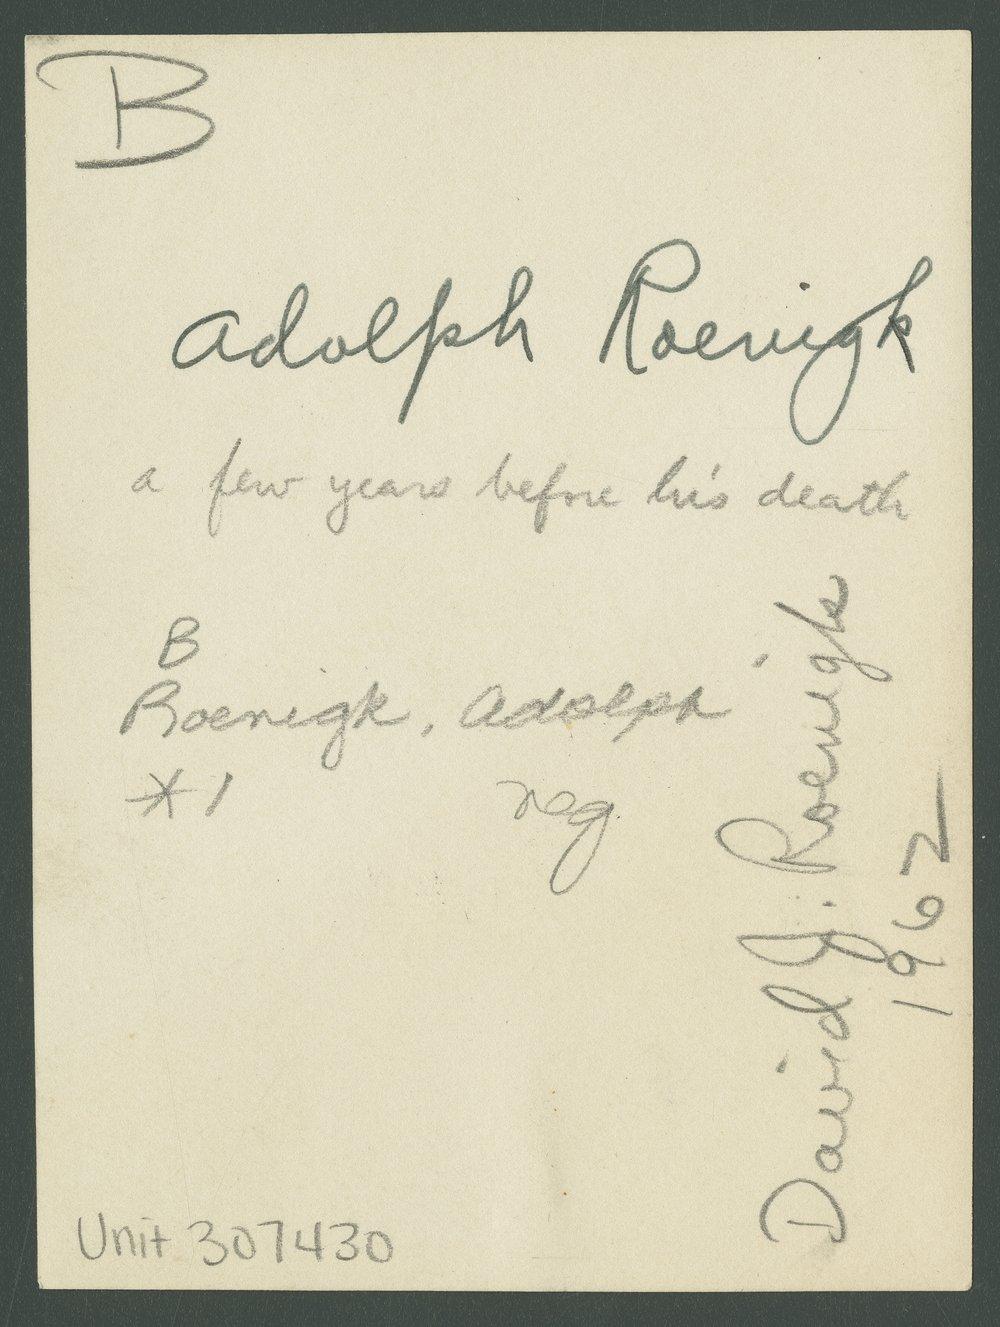 Adolph Roenigk - 2